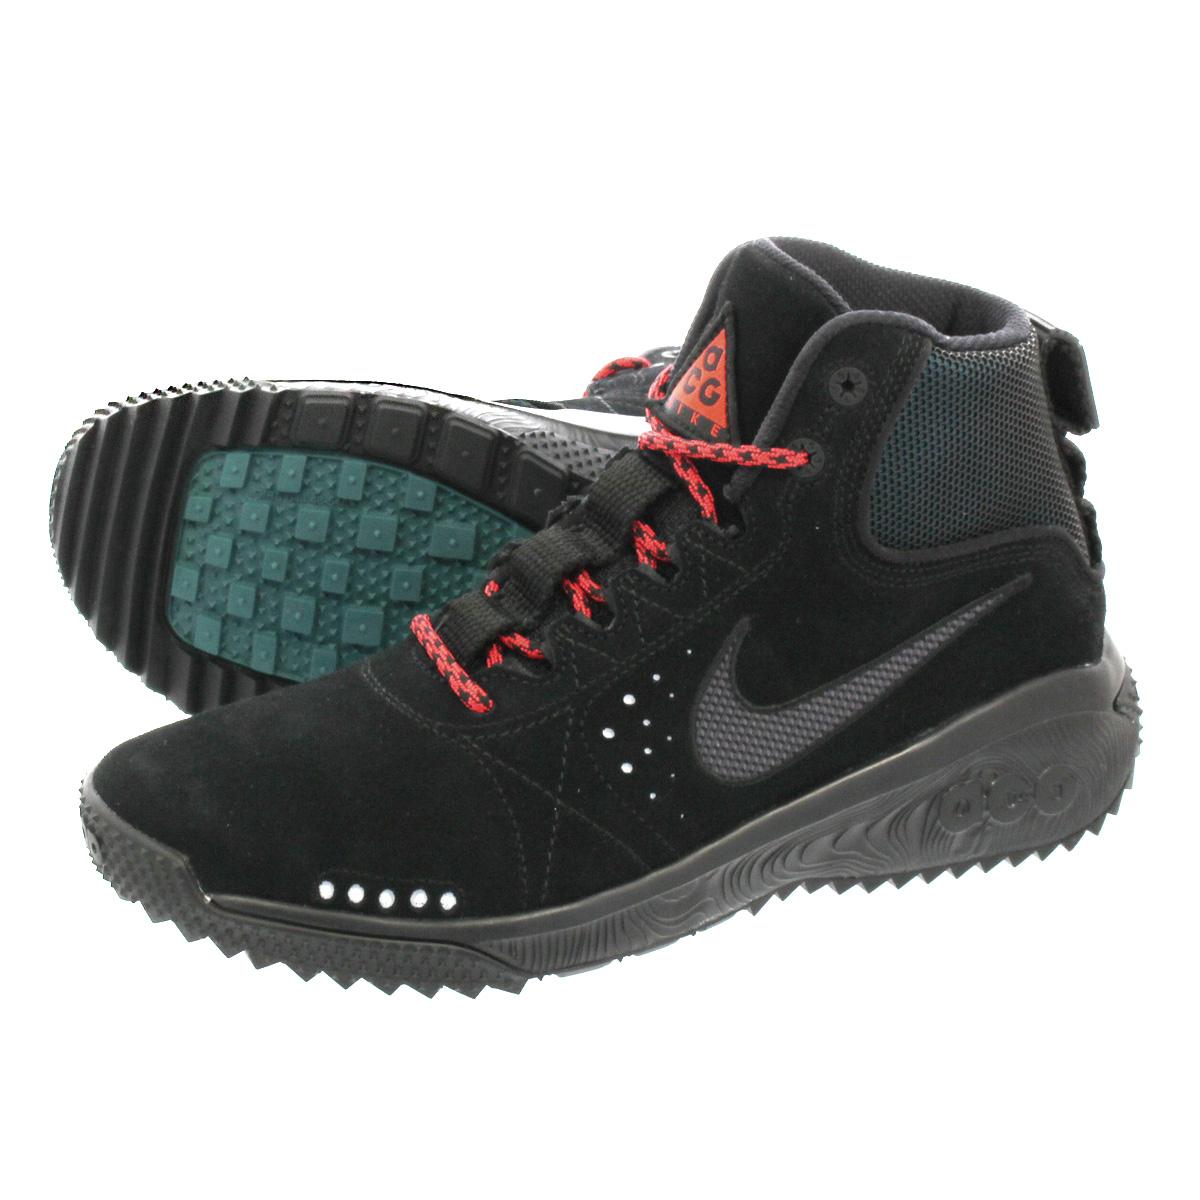 wholesale dealer 53ccf 0ab04 NIKE ACG ANGEL  S REST Nike ACG Angels rest BLACK OIL GREY THUNDER ...